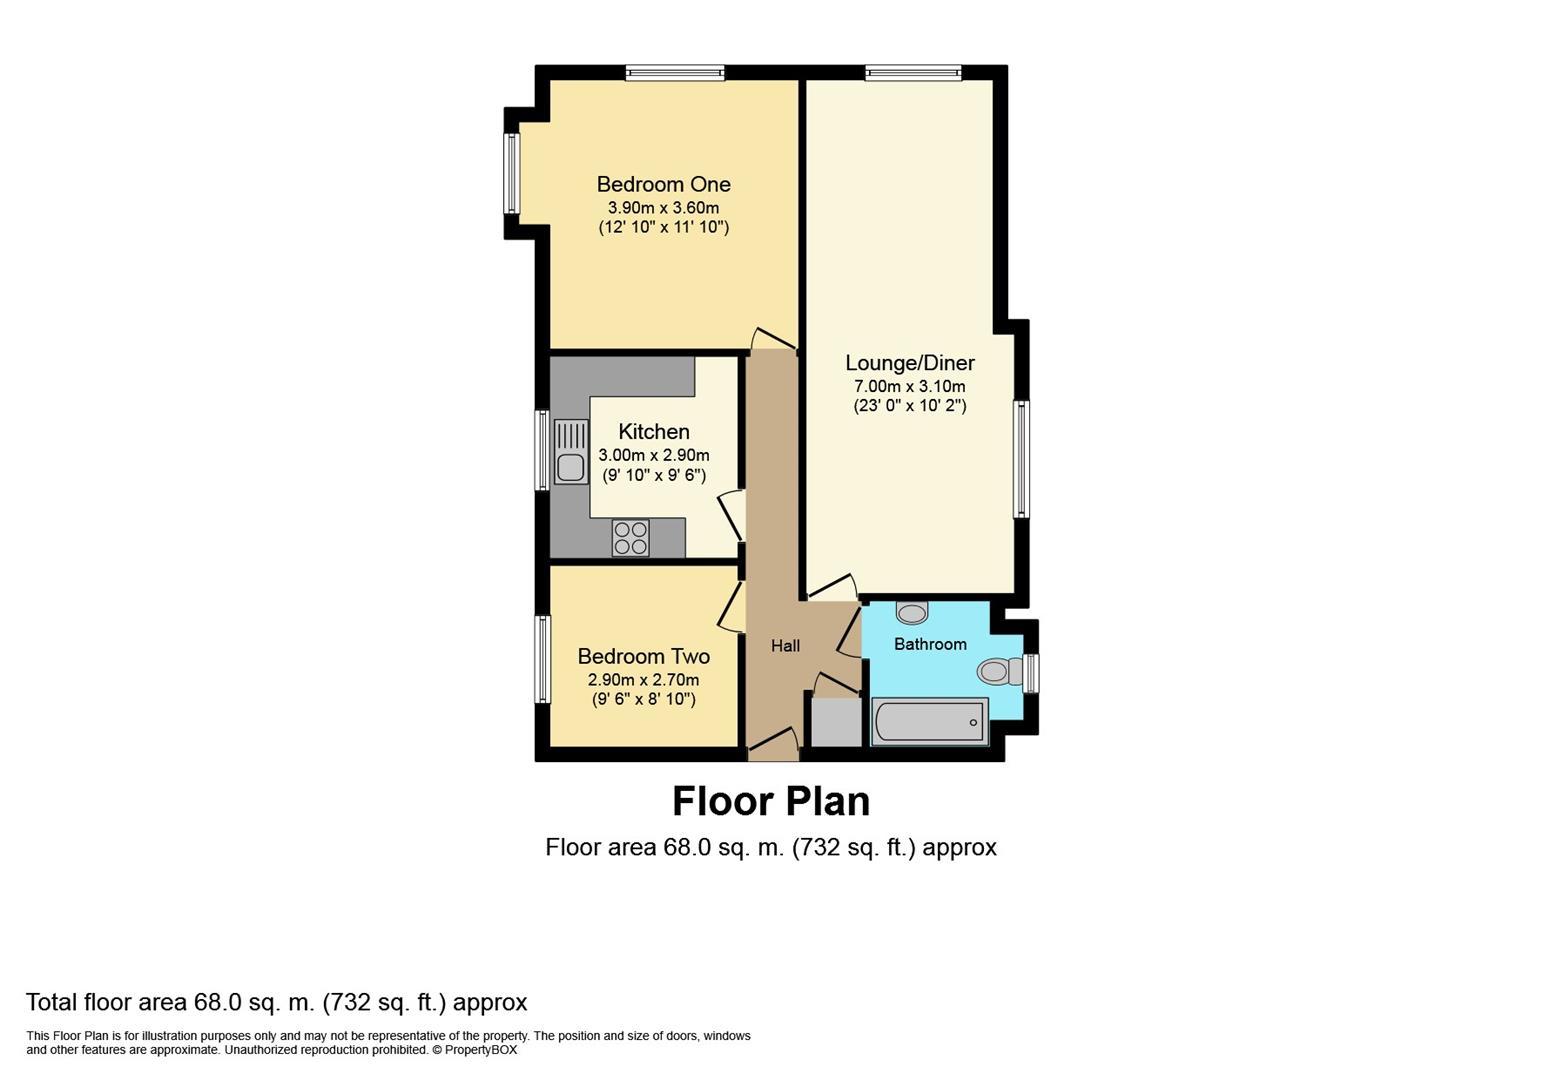 2D_Plan_2 (5).jpg